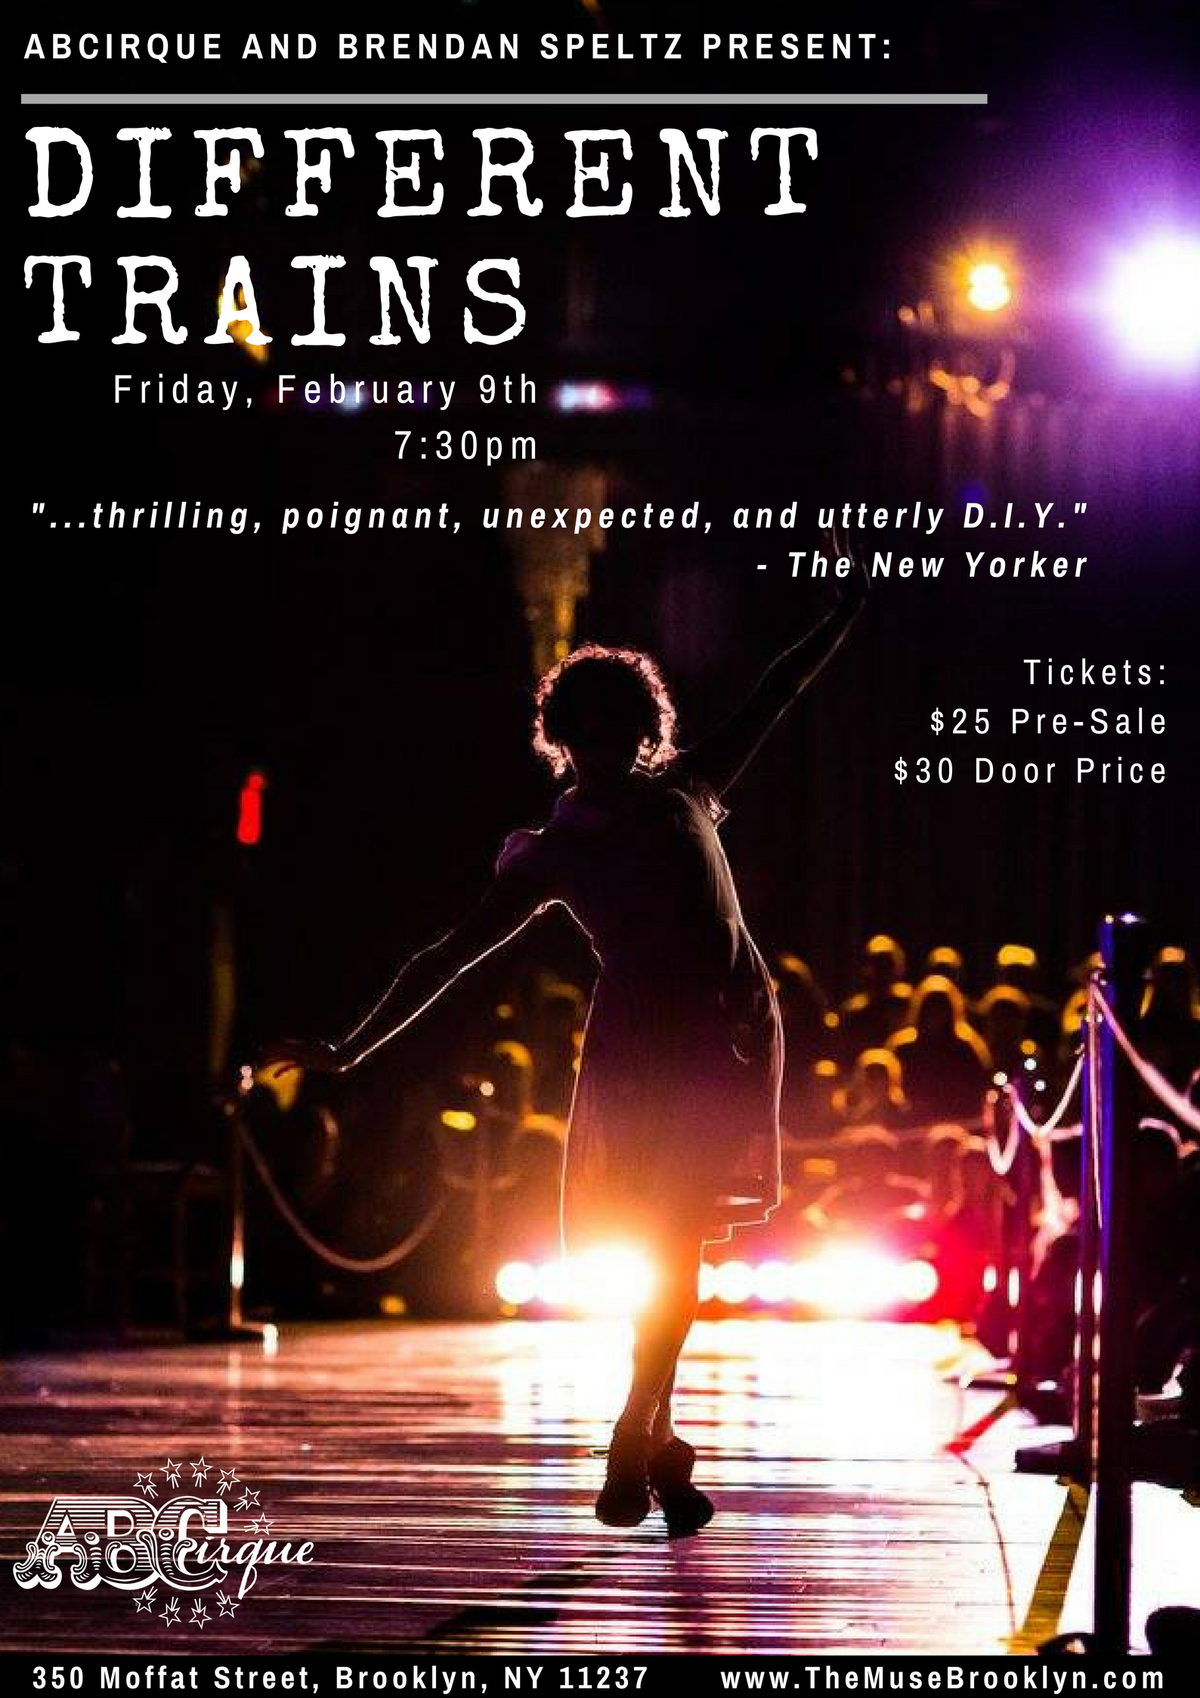 Different Trains - Circus Events - CircusTalk